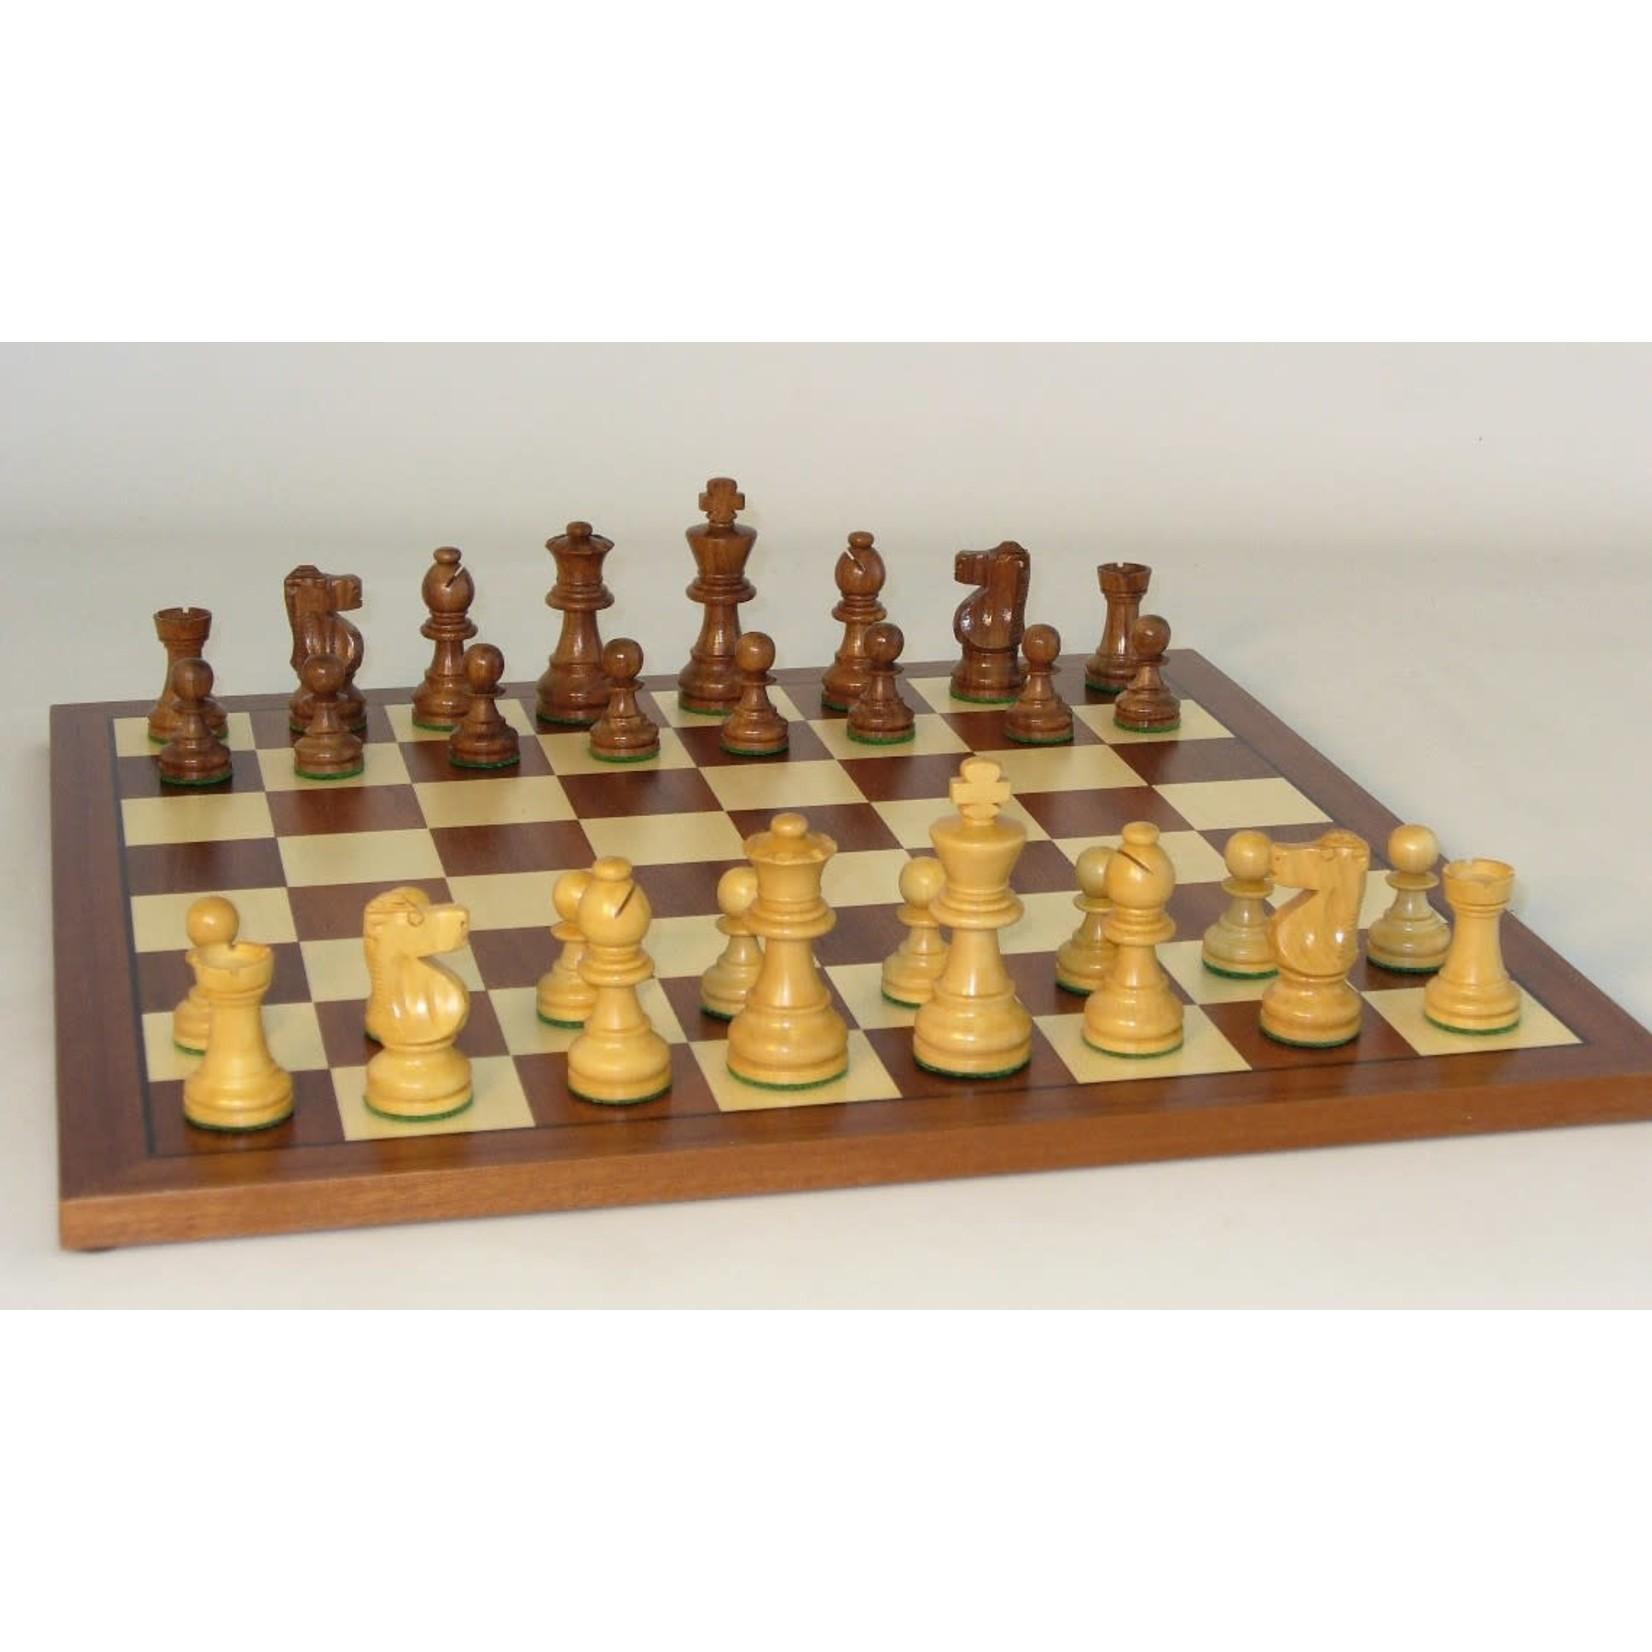 "WorldWise Imports Chess - 3"" Sheesham French on Maple Board"